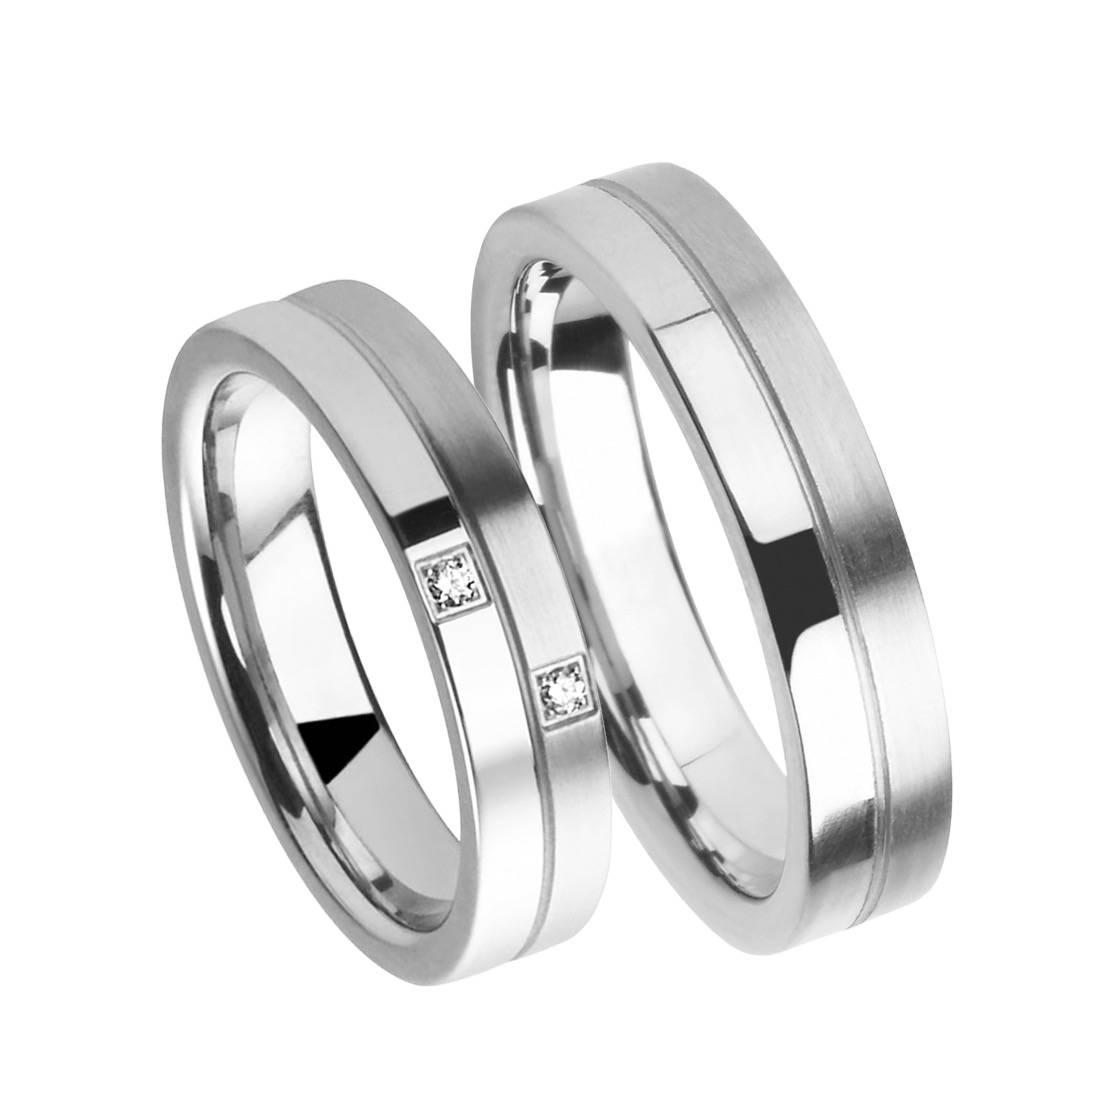 Juwelier Jan Maes - Trouwringen - Verlovingsringen - Juwelen - House of Weddings - 4